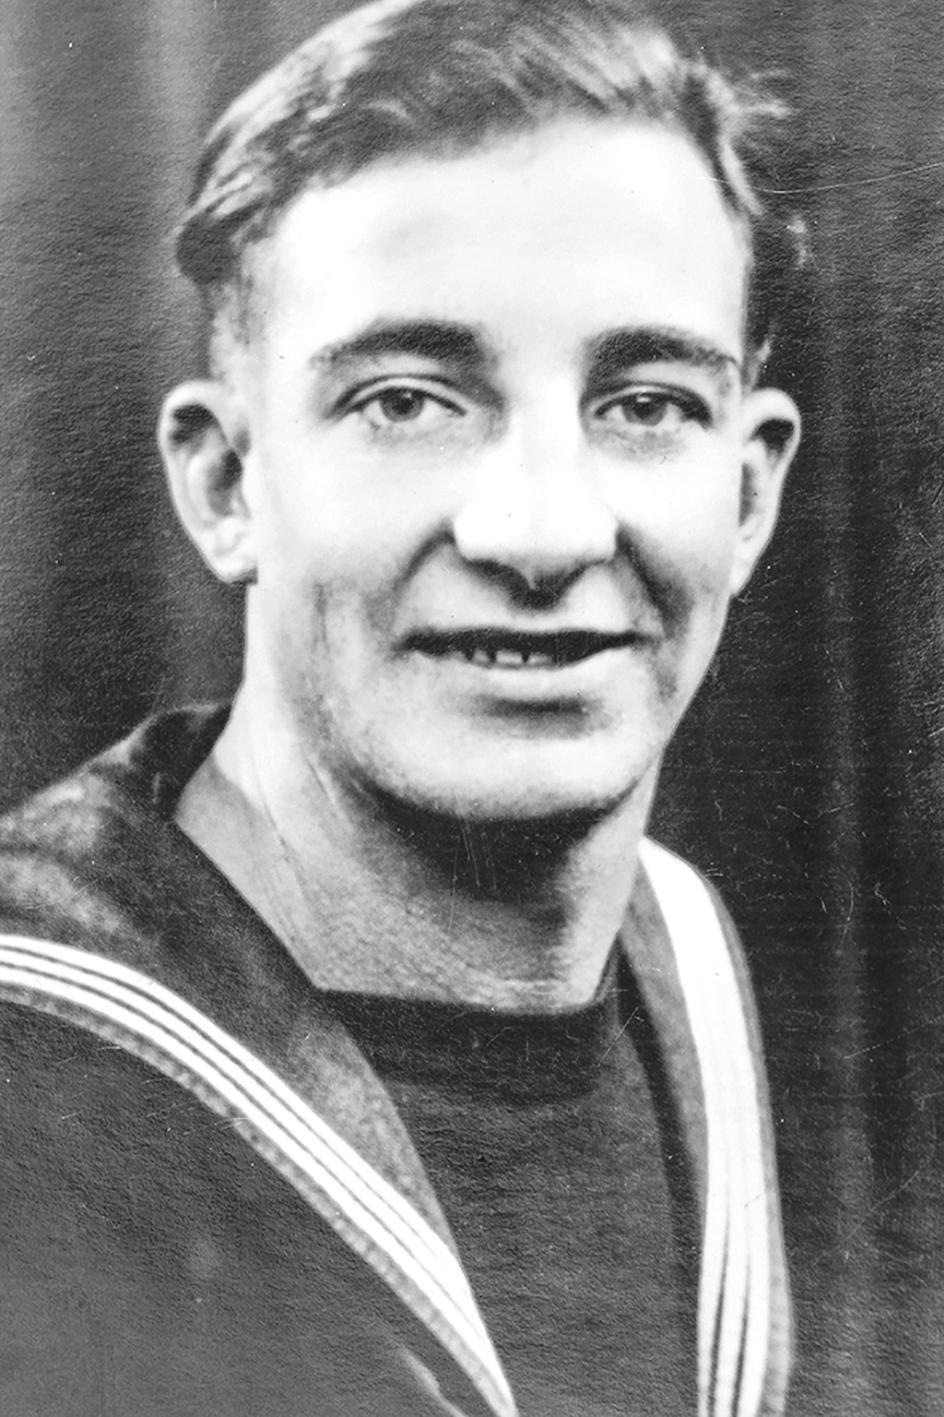 Lewis Lloyd Kerry, leading telegraphist, Royal Navy.